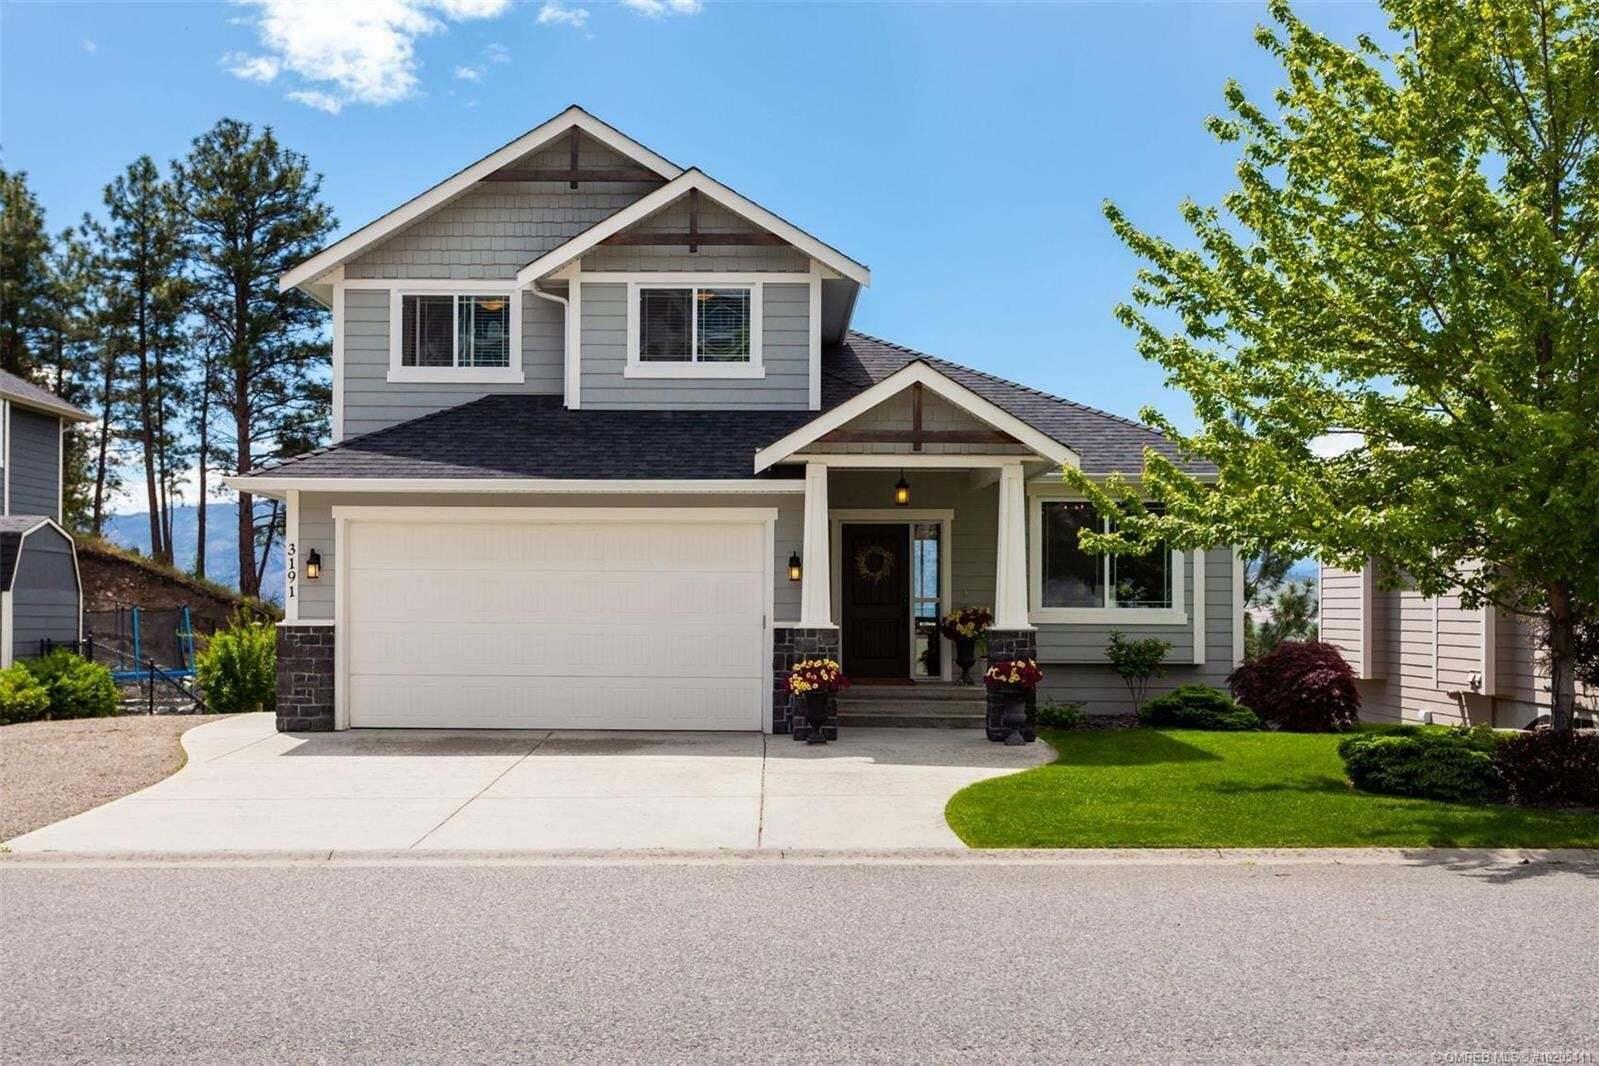 House for sale at 3191 Saddleback Pl West Kelowna British Columbia - MLS: 10205411